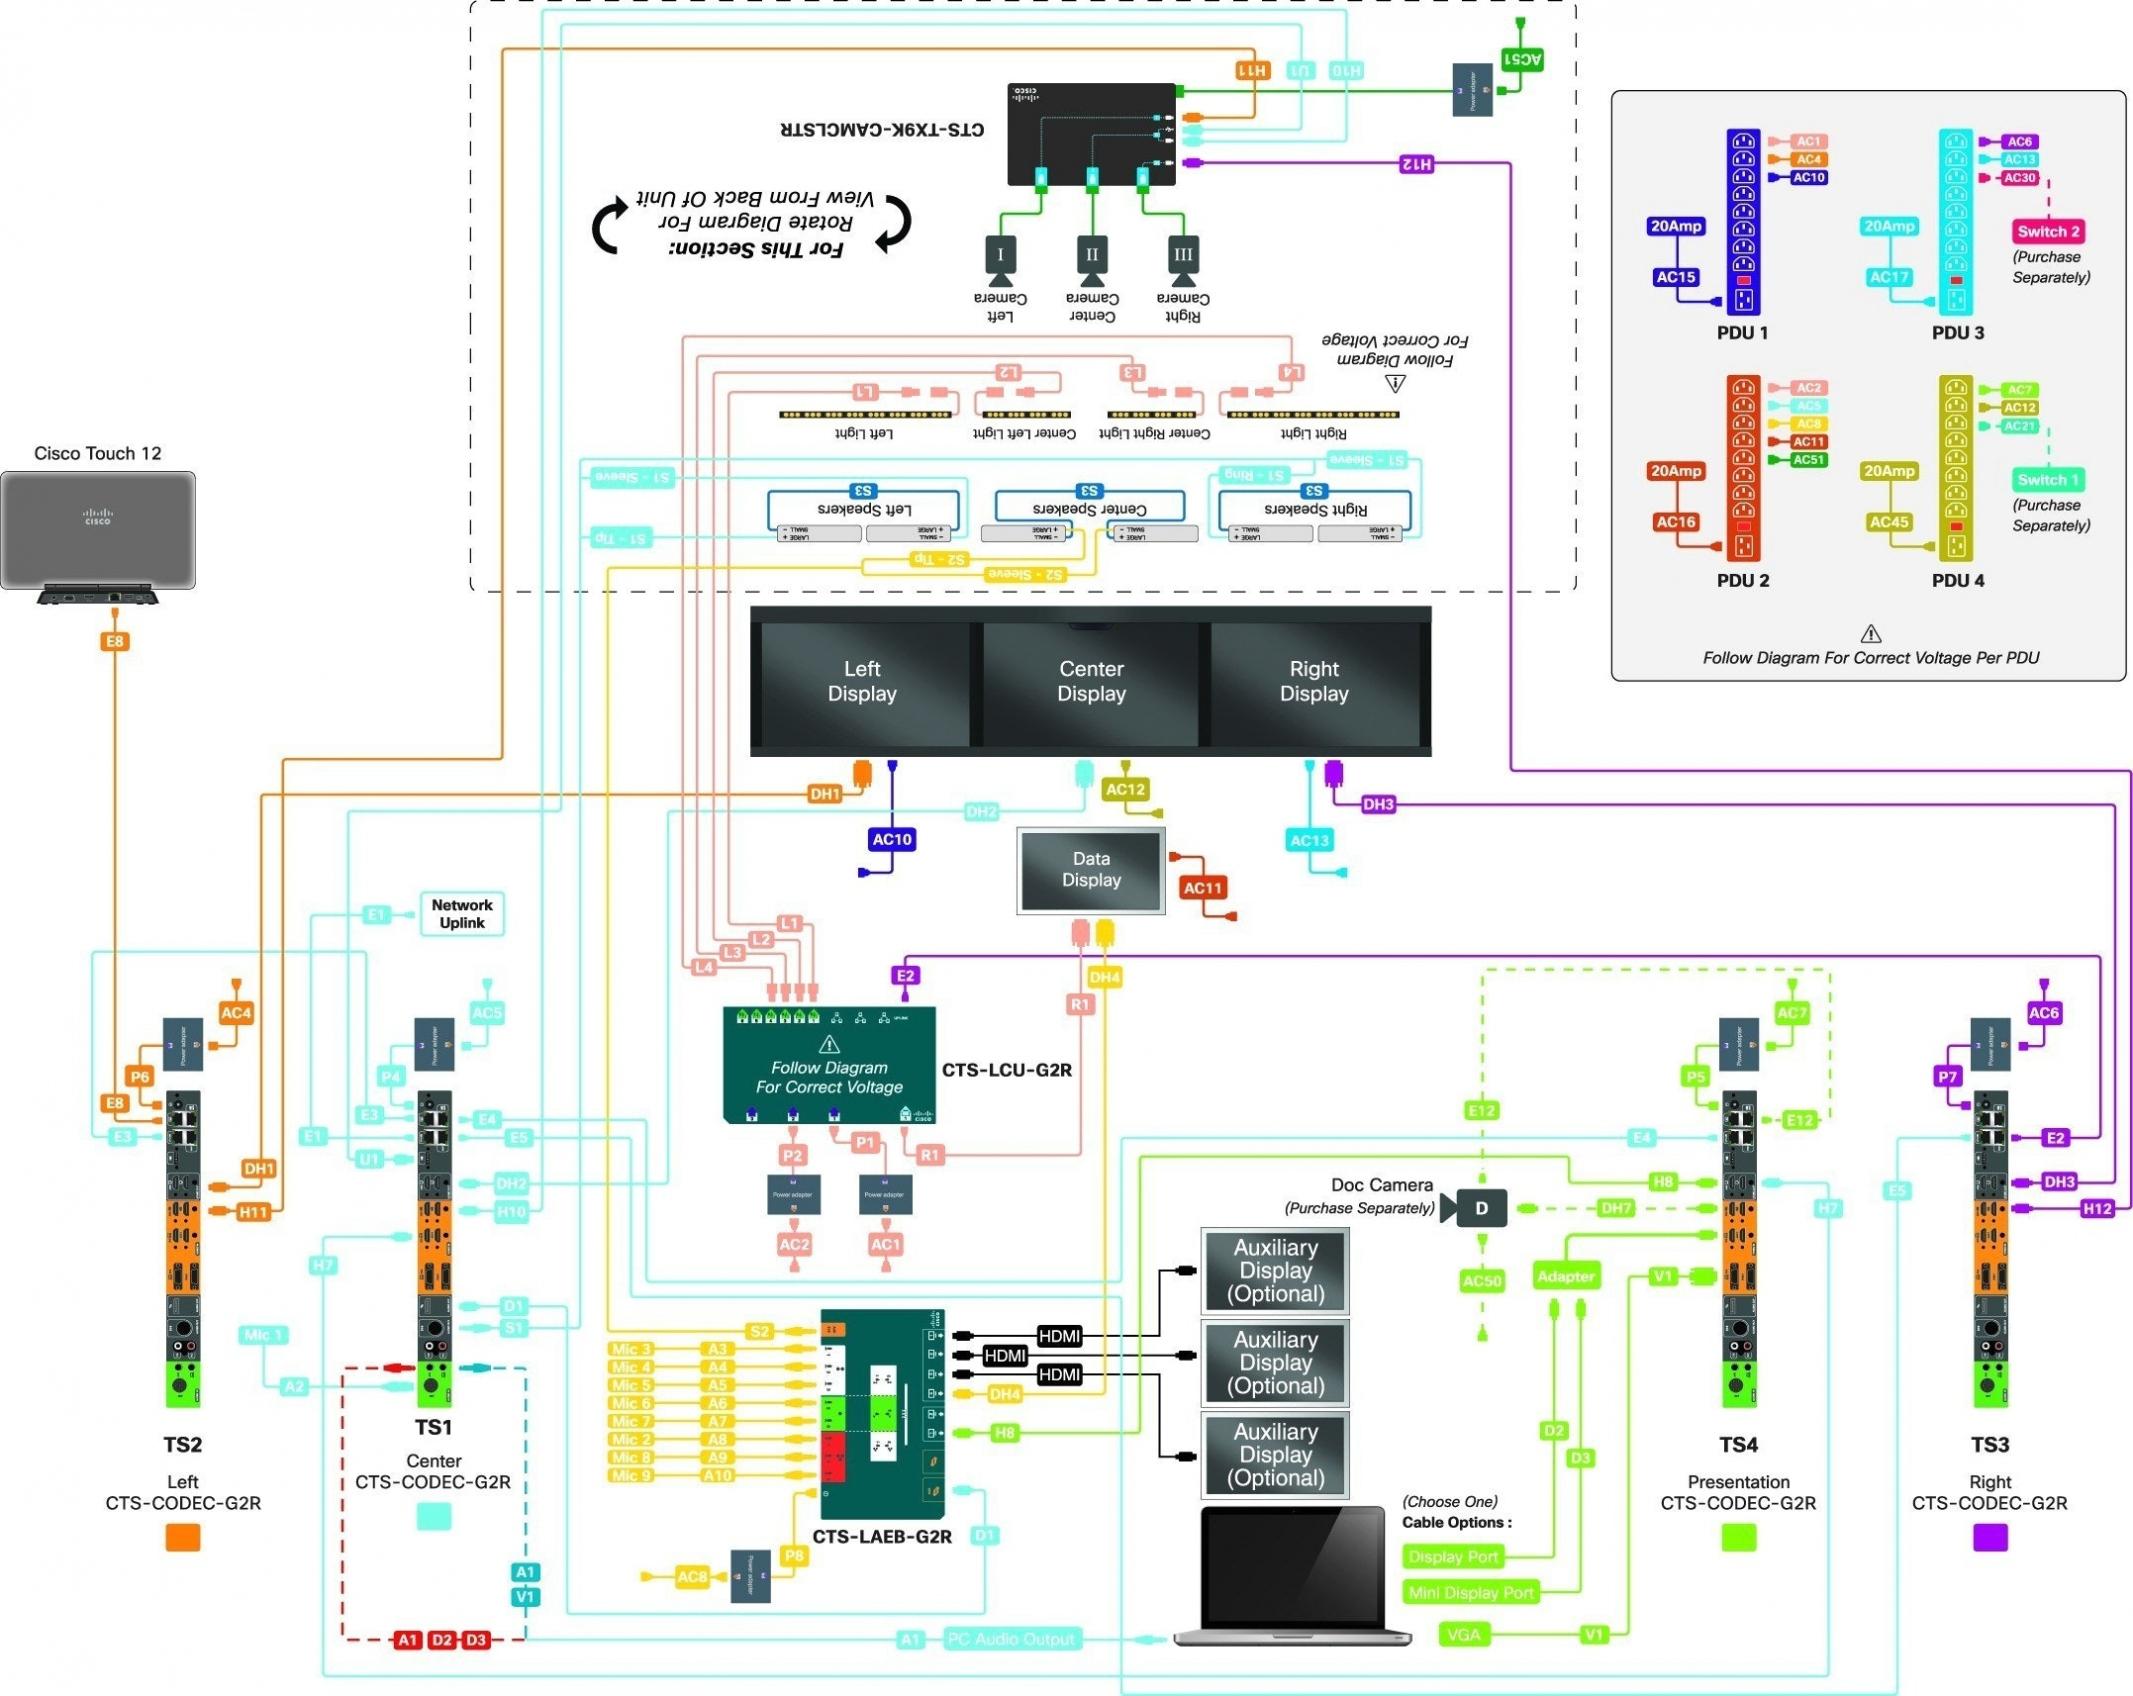 Mini Usb To Hdmi Wiring Diagram | Wiring Diagram - Micro Usb To Hdmi Wiring Diagram